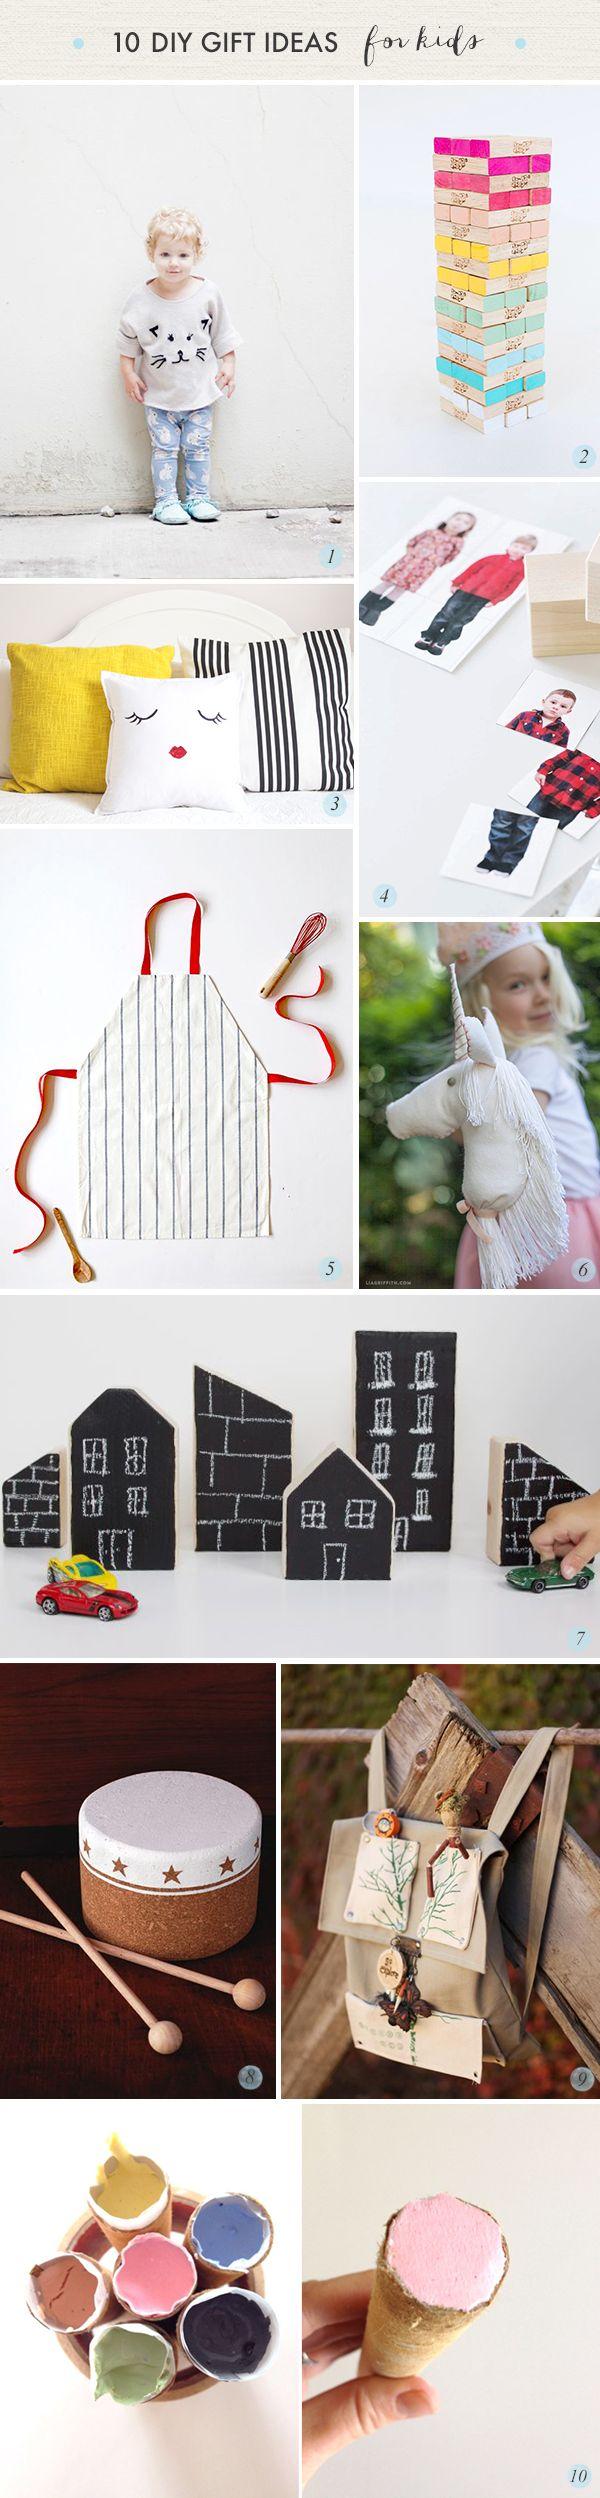 30 DIY Gift Ideas